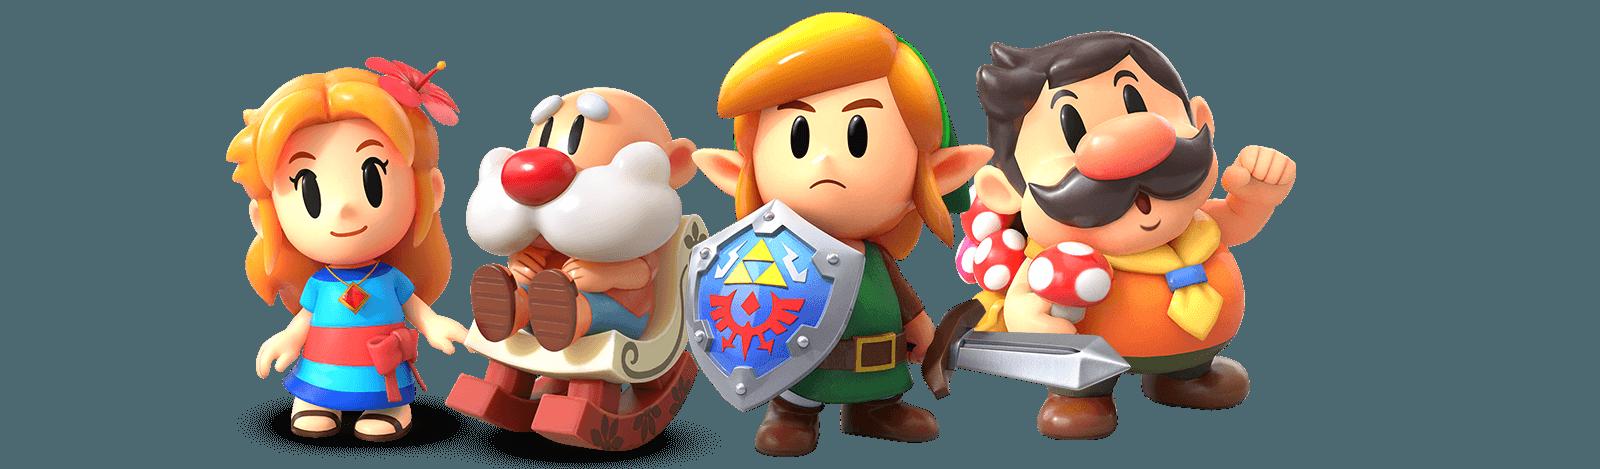 Link's Awakening Characters